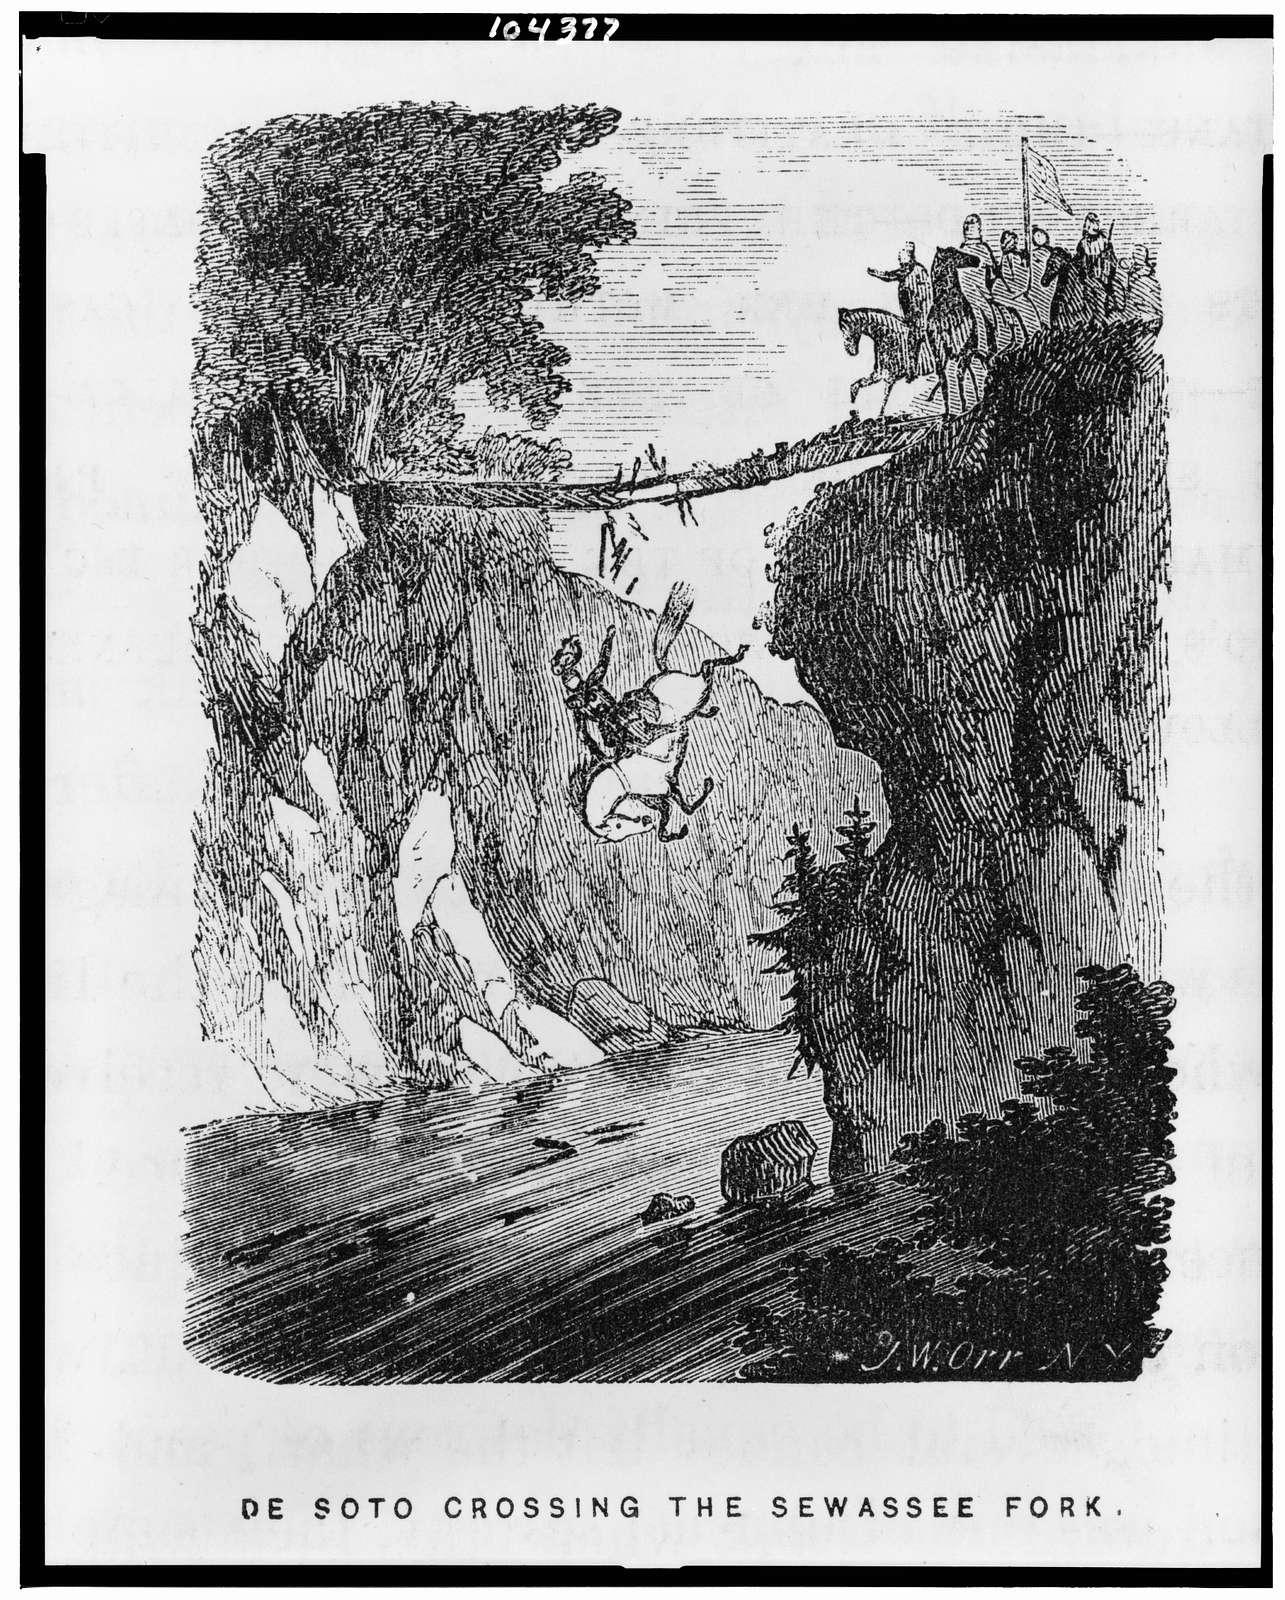 De Soto crossing the Sewassee fork / J.W. Orr, N.Y.